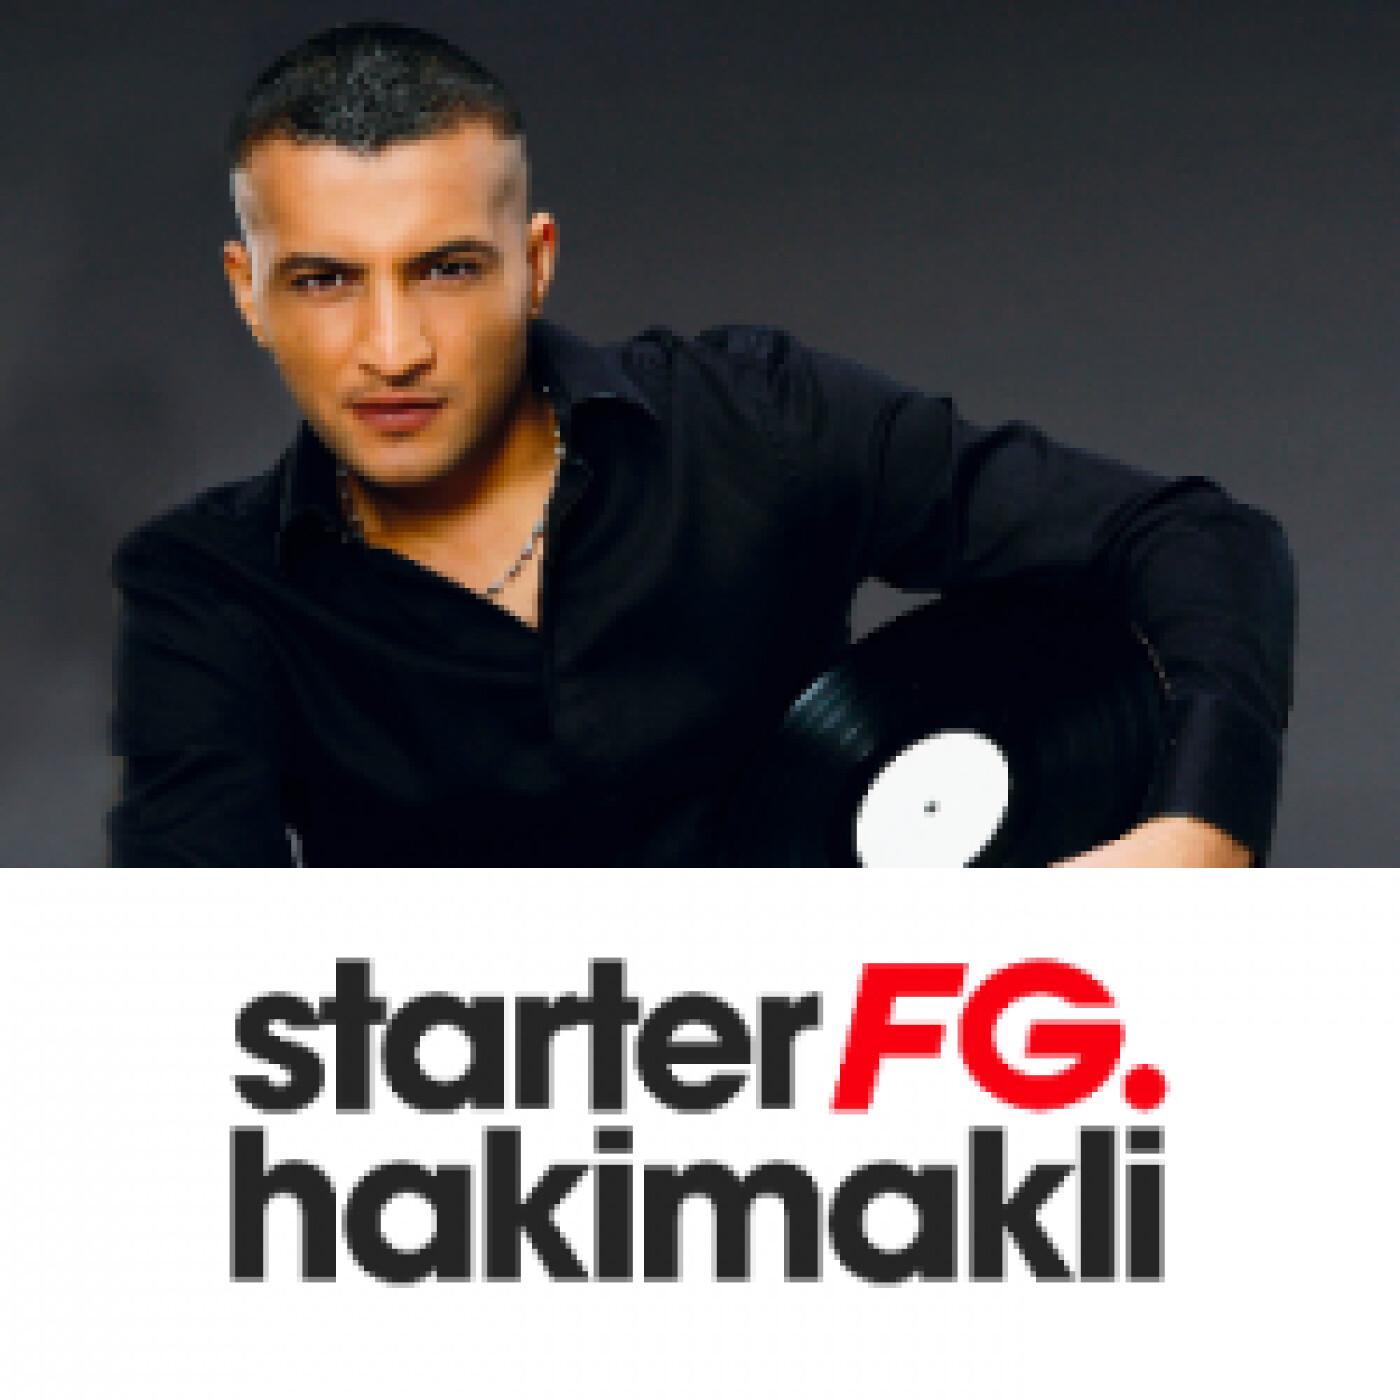 STARTER FG BY HAKIMAKLI MERCREDI 27 JANVIER 2021